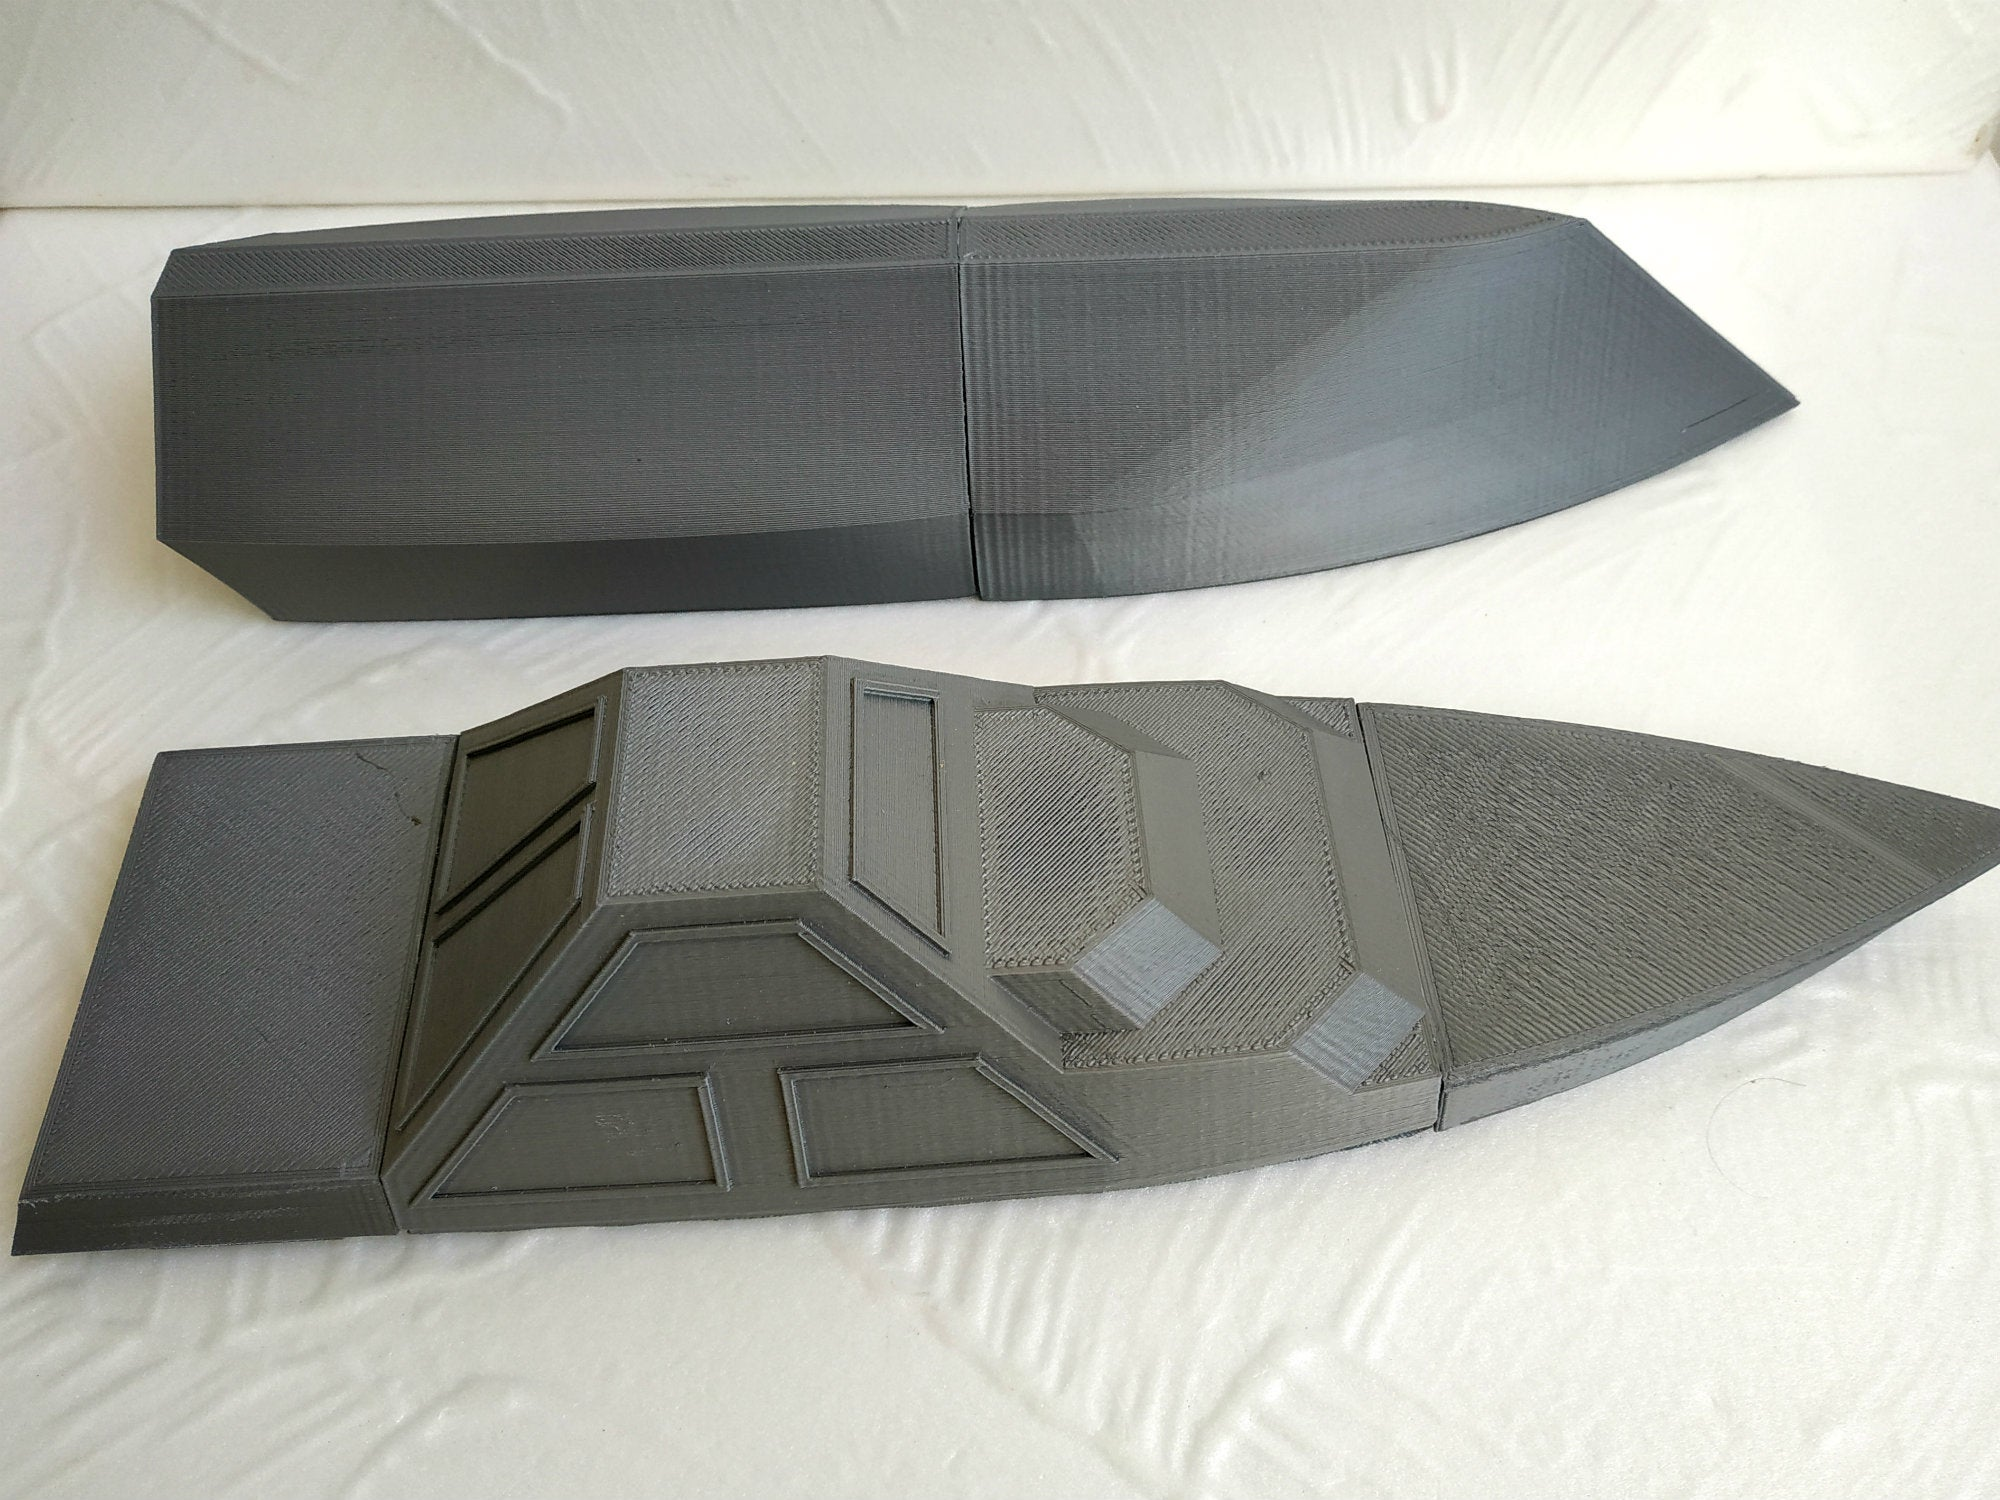 DARINS_8_1.jpg Download free STL file DARINS - stealth boat with reactionless propulsion drive • 3D printer design, TanyaAkinora